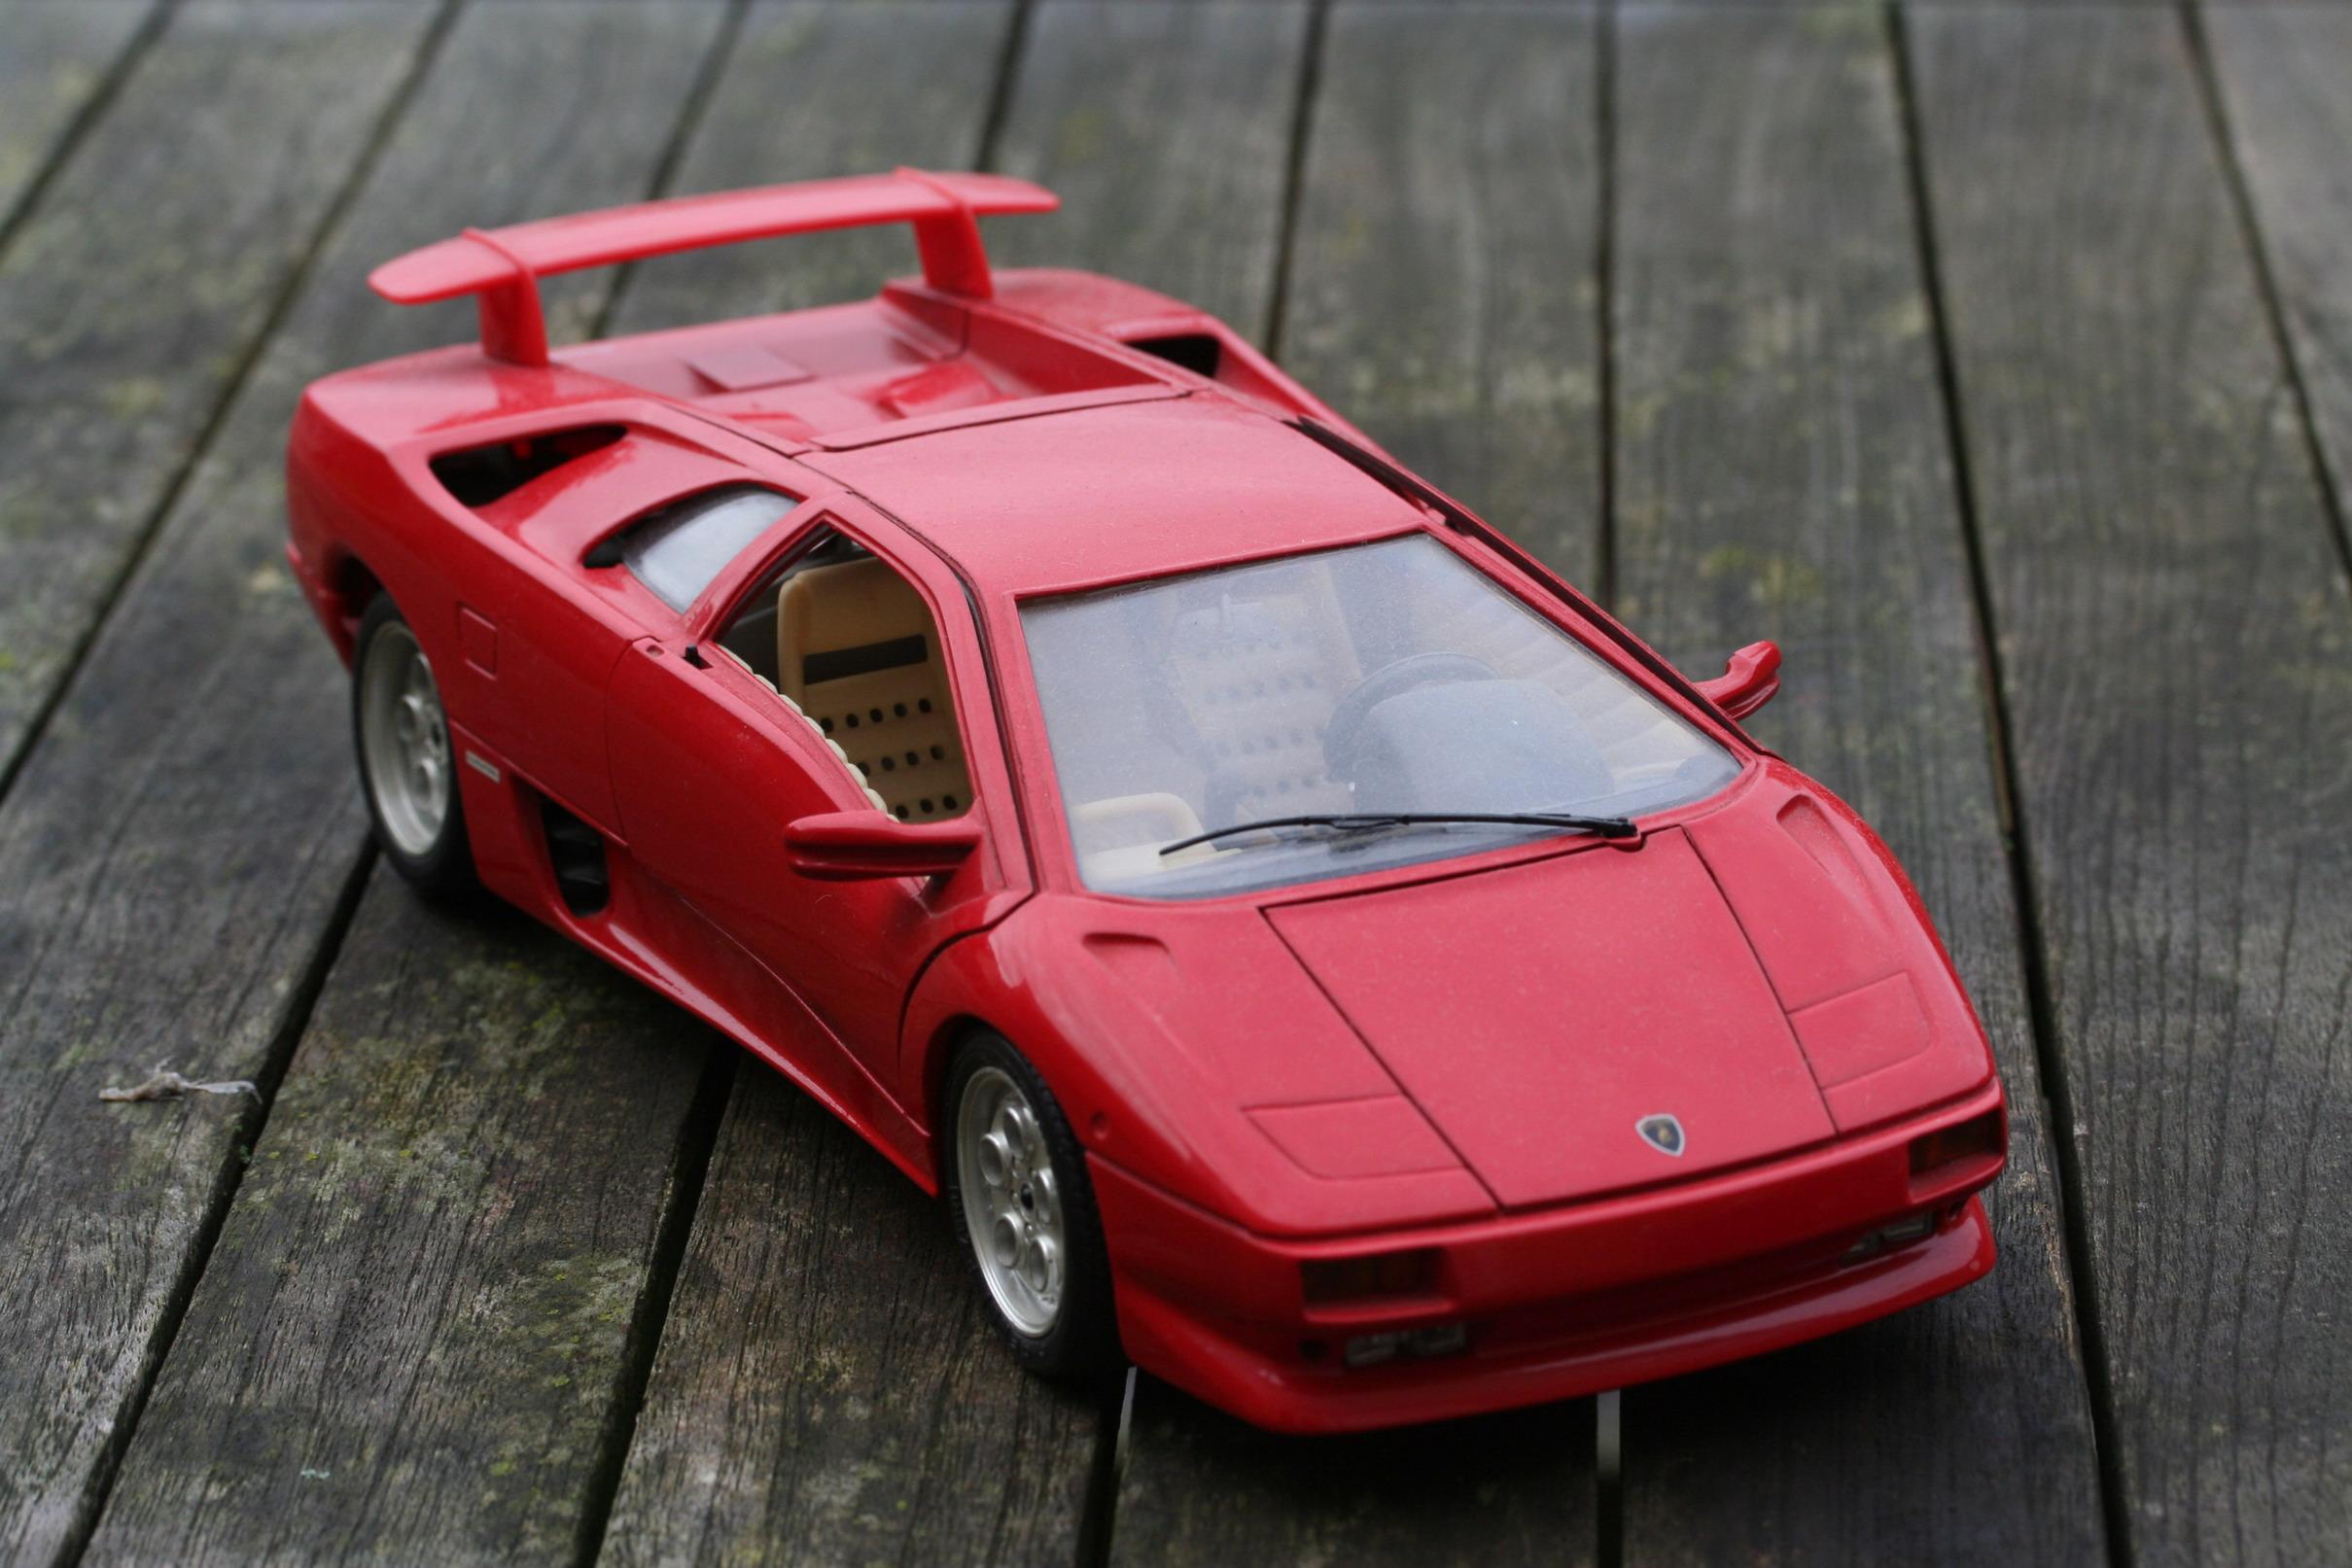 Lamborghini_Bburago Cool Lamborghini Countach Diecast 1 18 Cars Trend